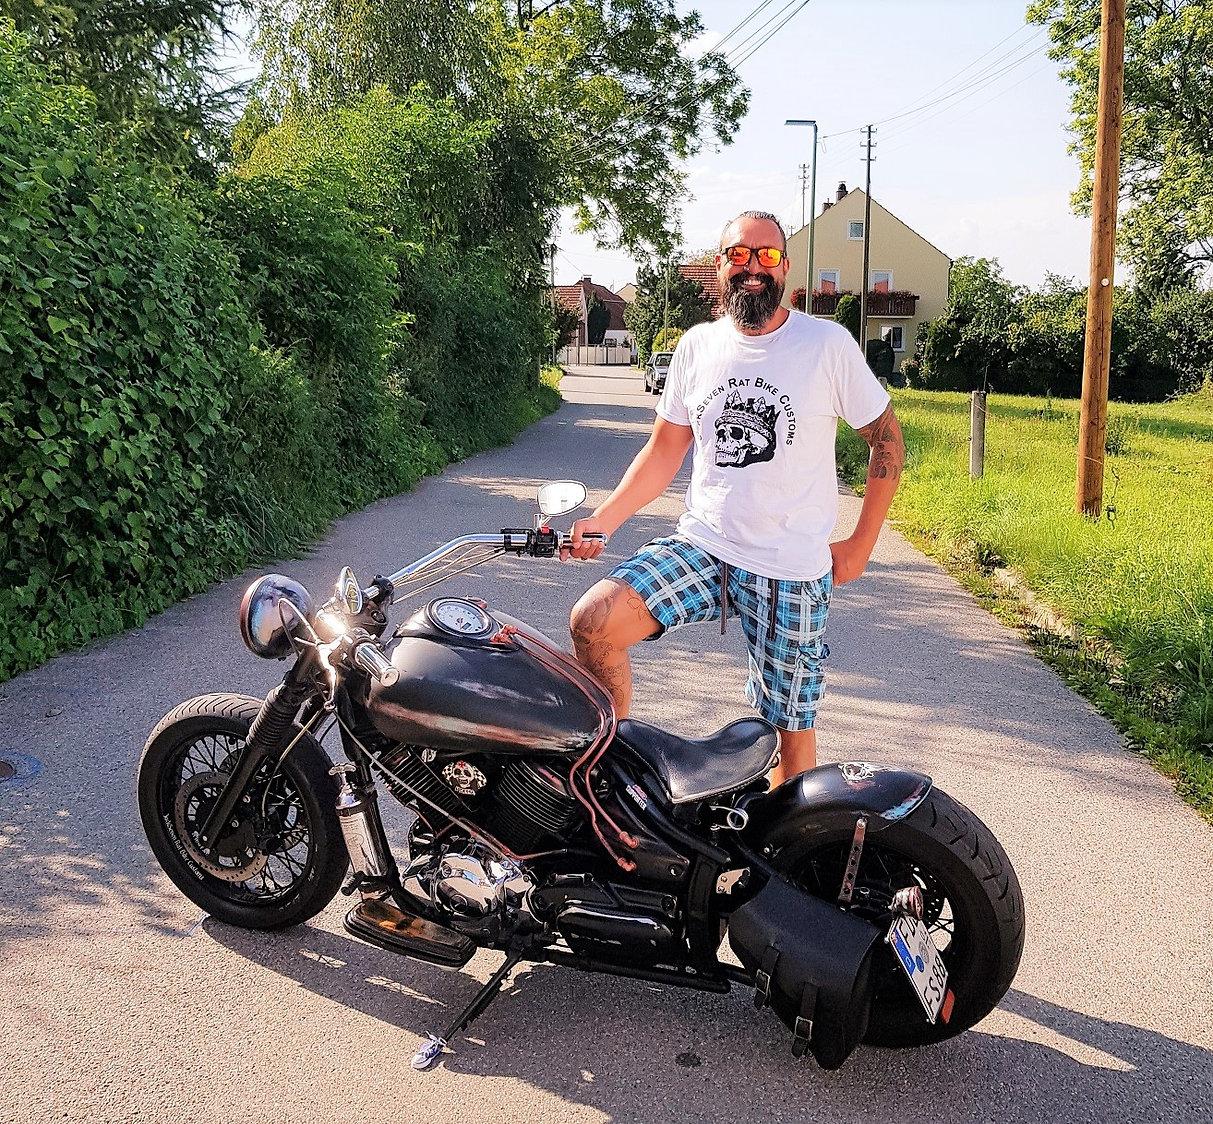 JackSeven Rat Bike Customs ueber uns.jpg